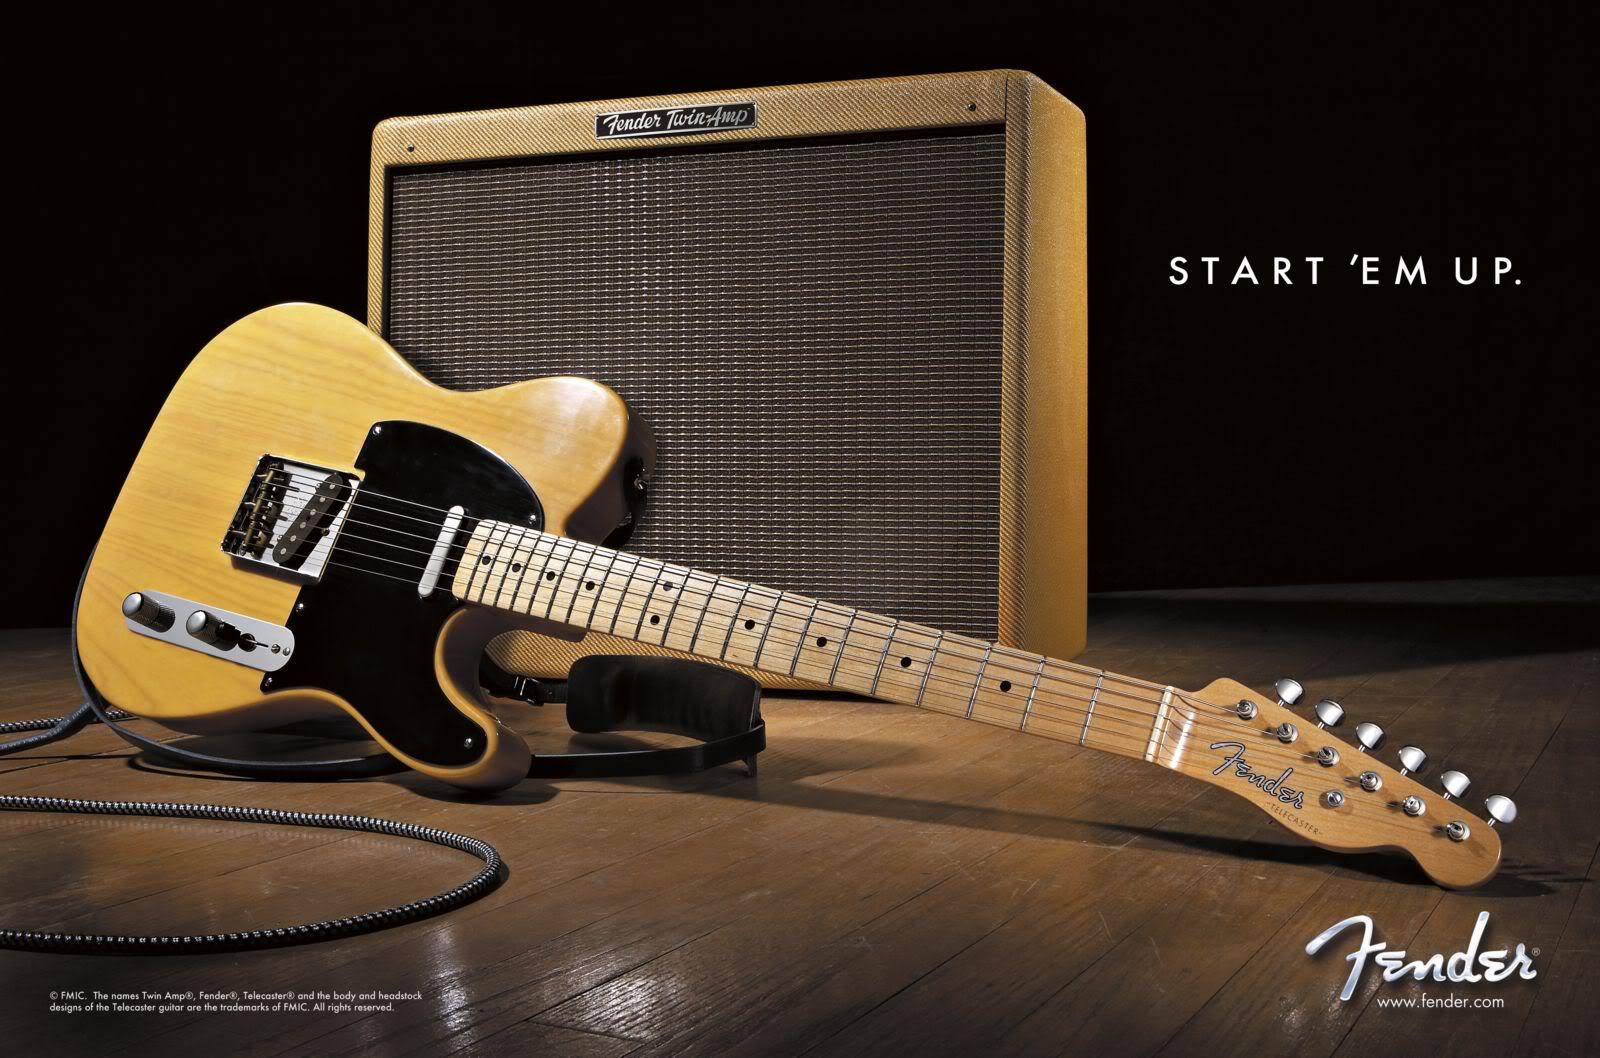 Fender Telecaster fotos y wallpapers CURSOS DE GUITARRA 1600x1058